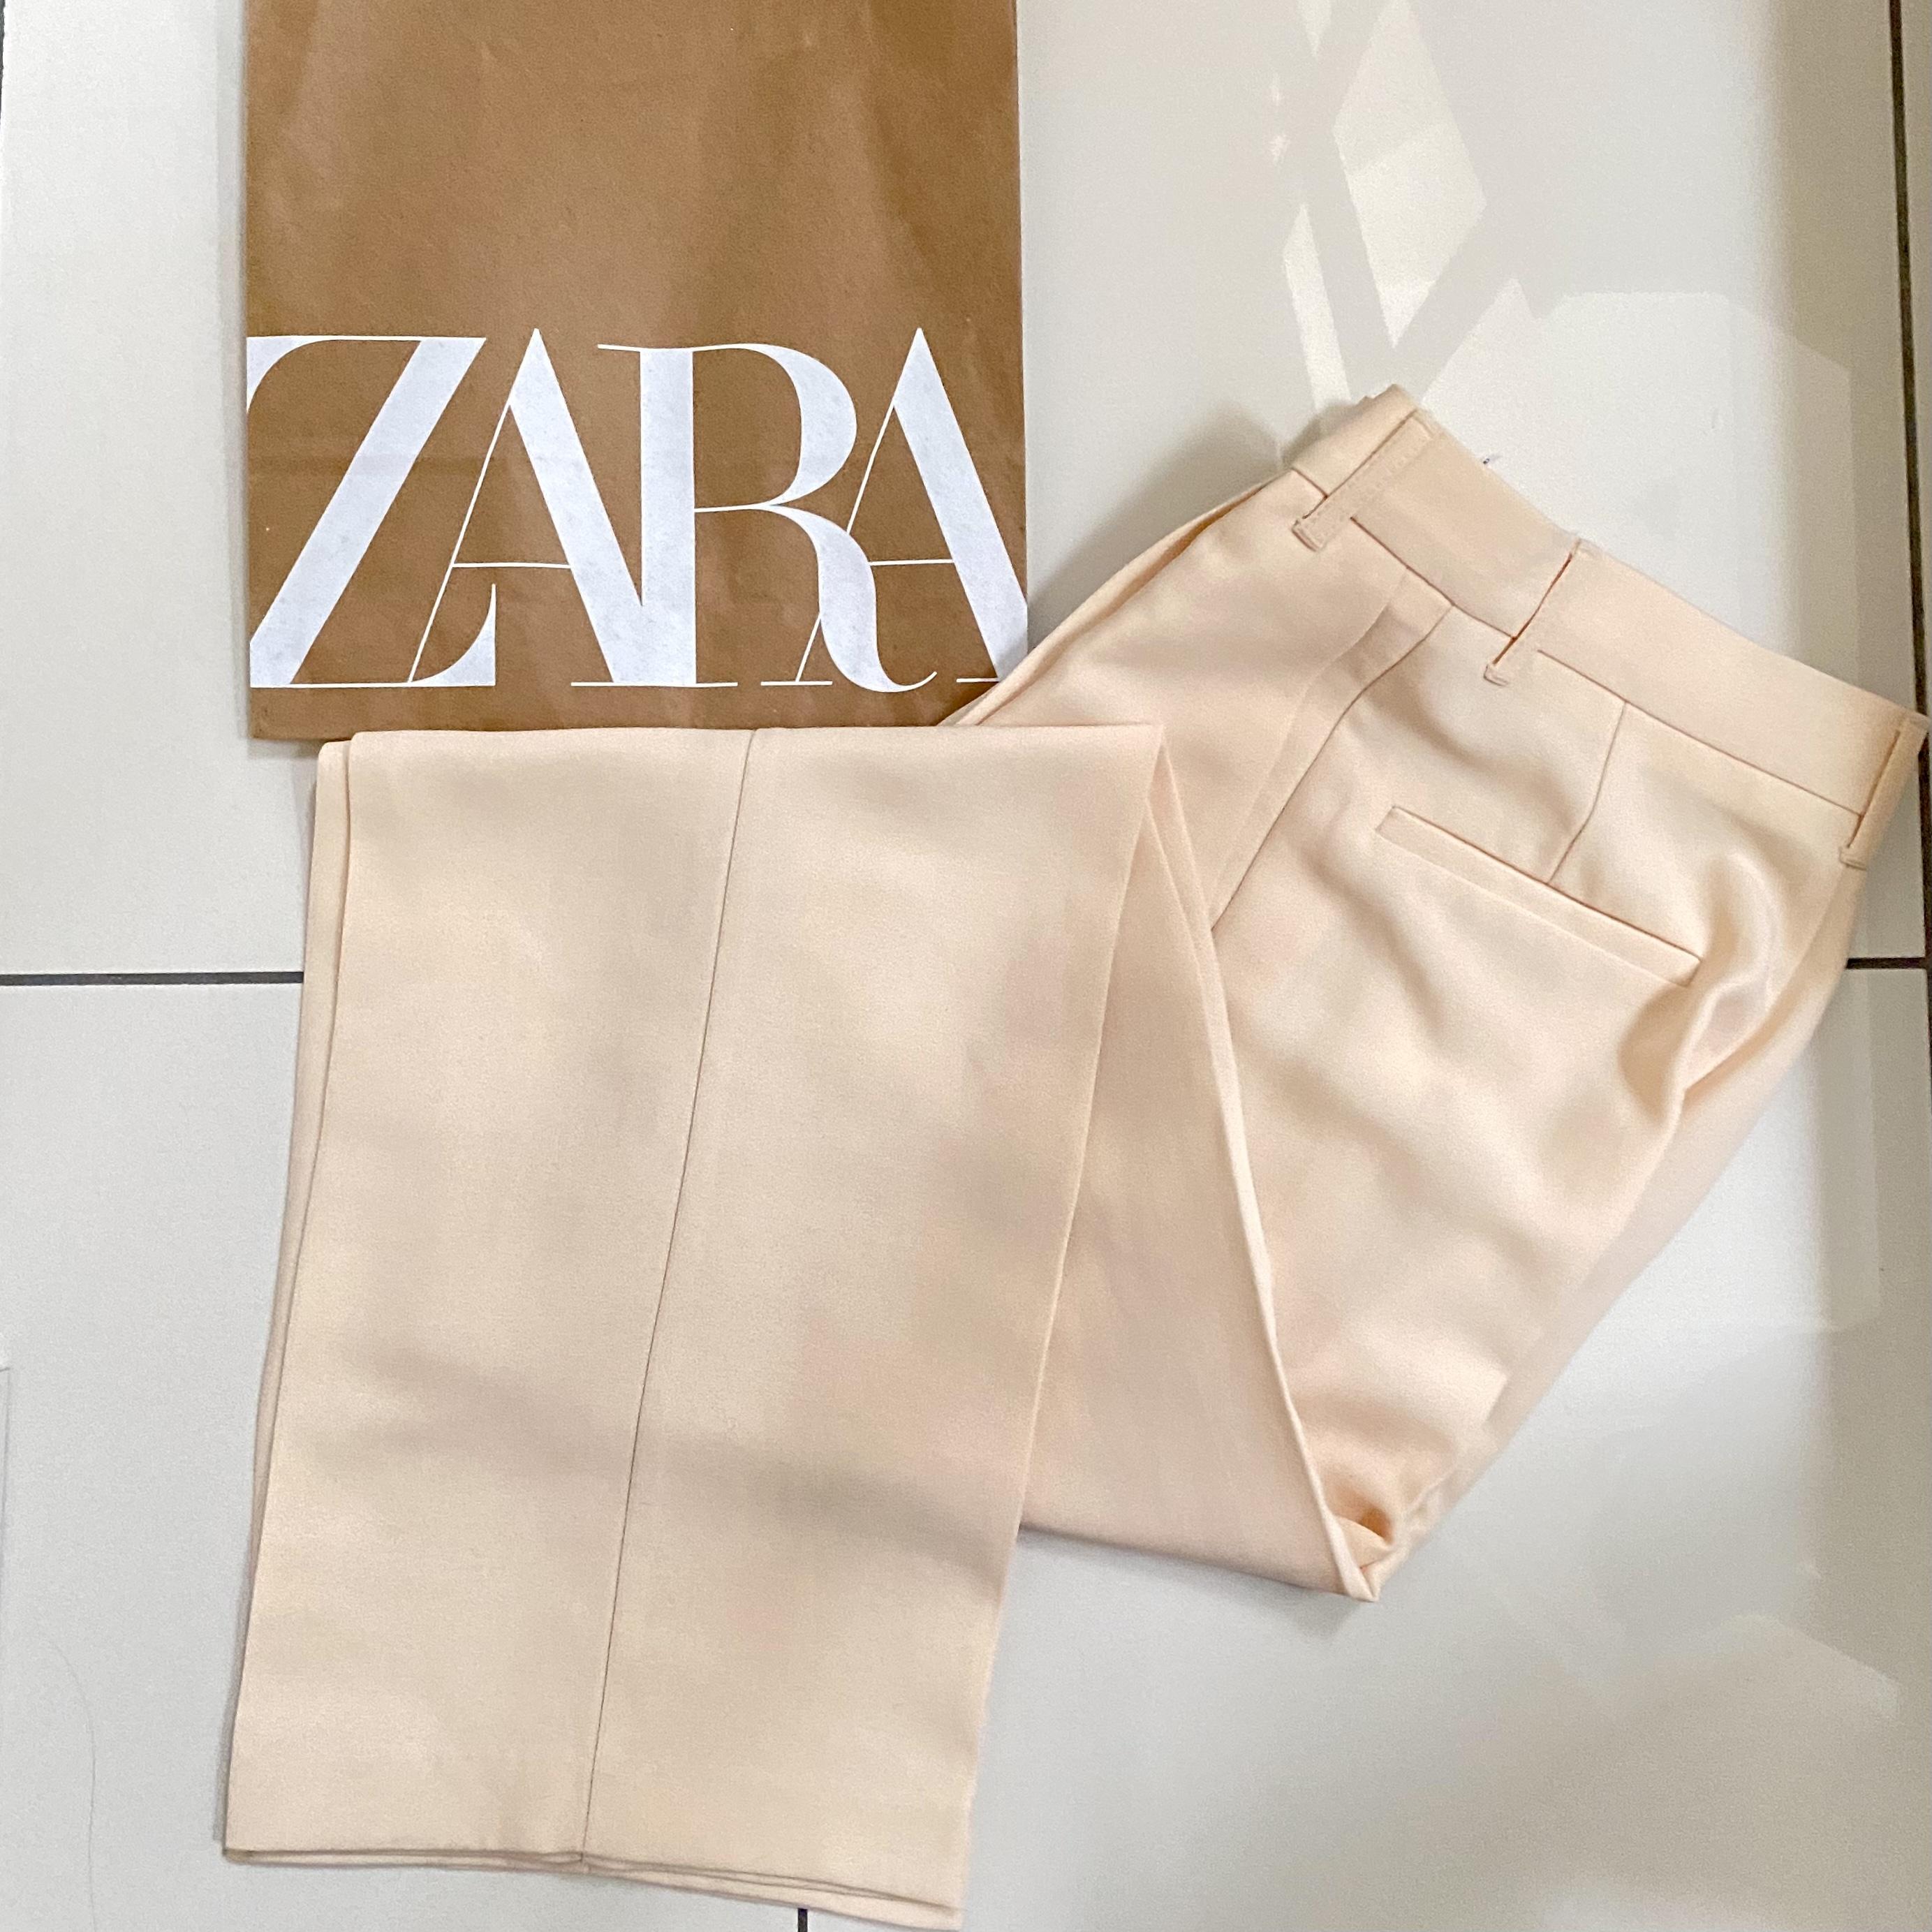 Zara ライトイエローのパンツ